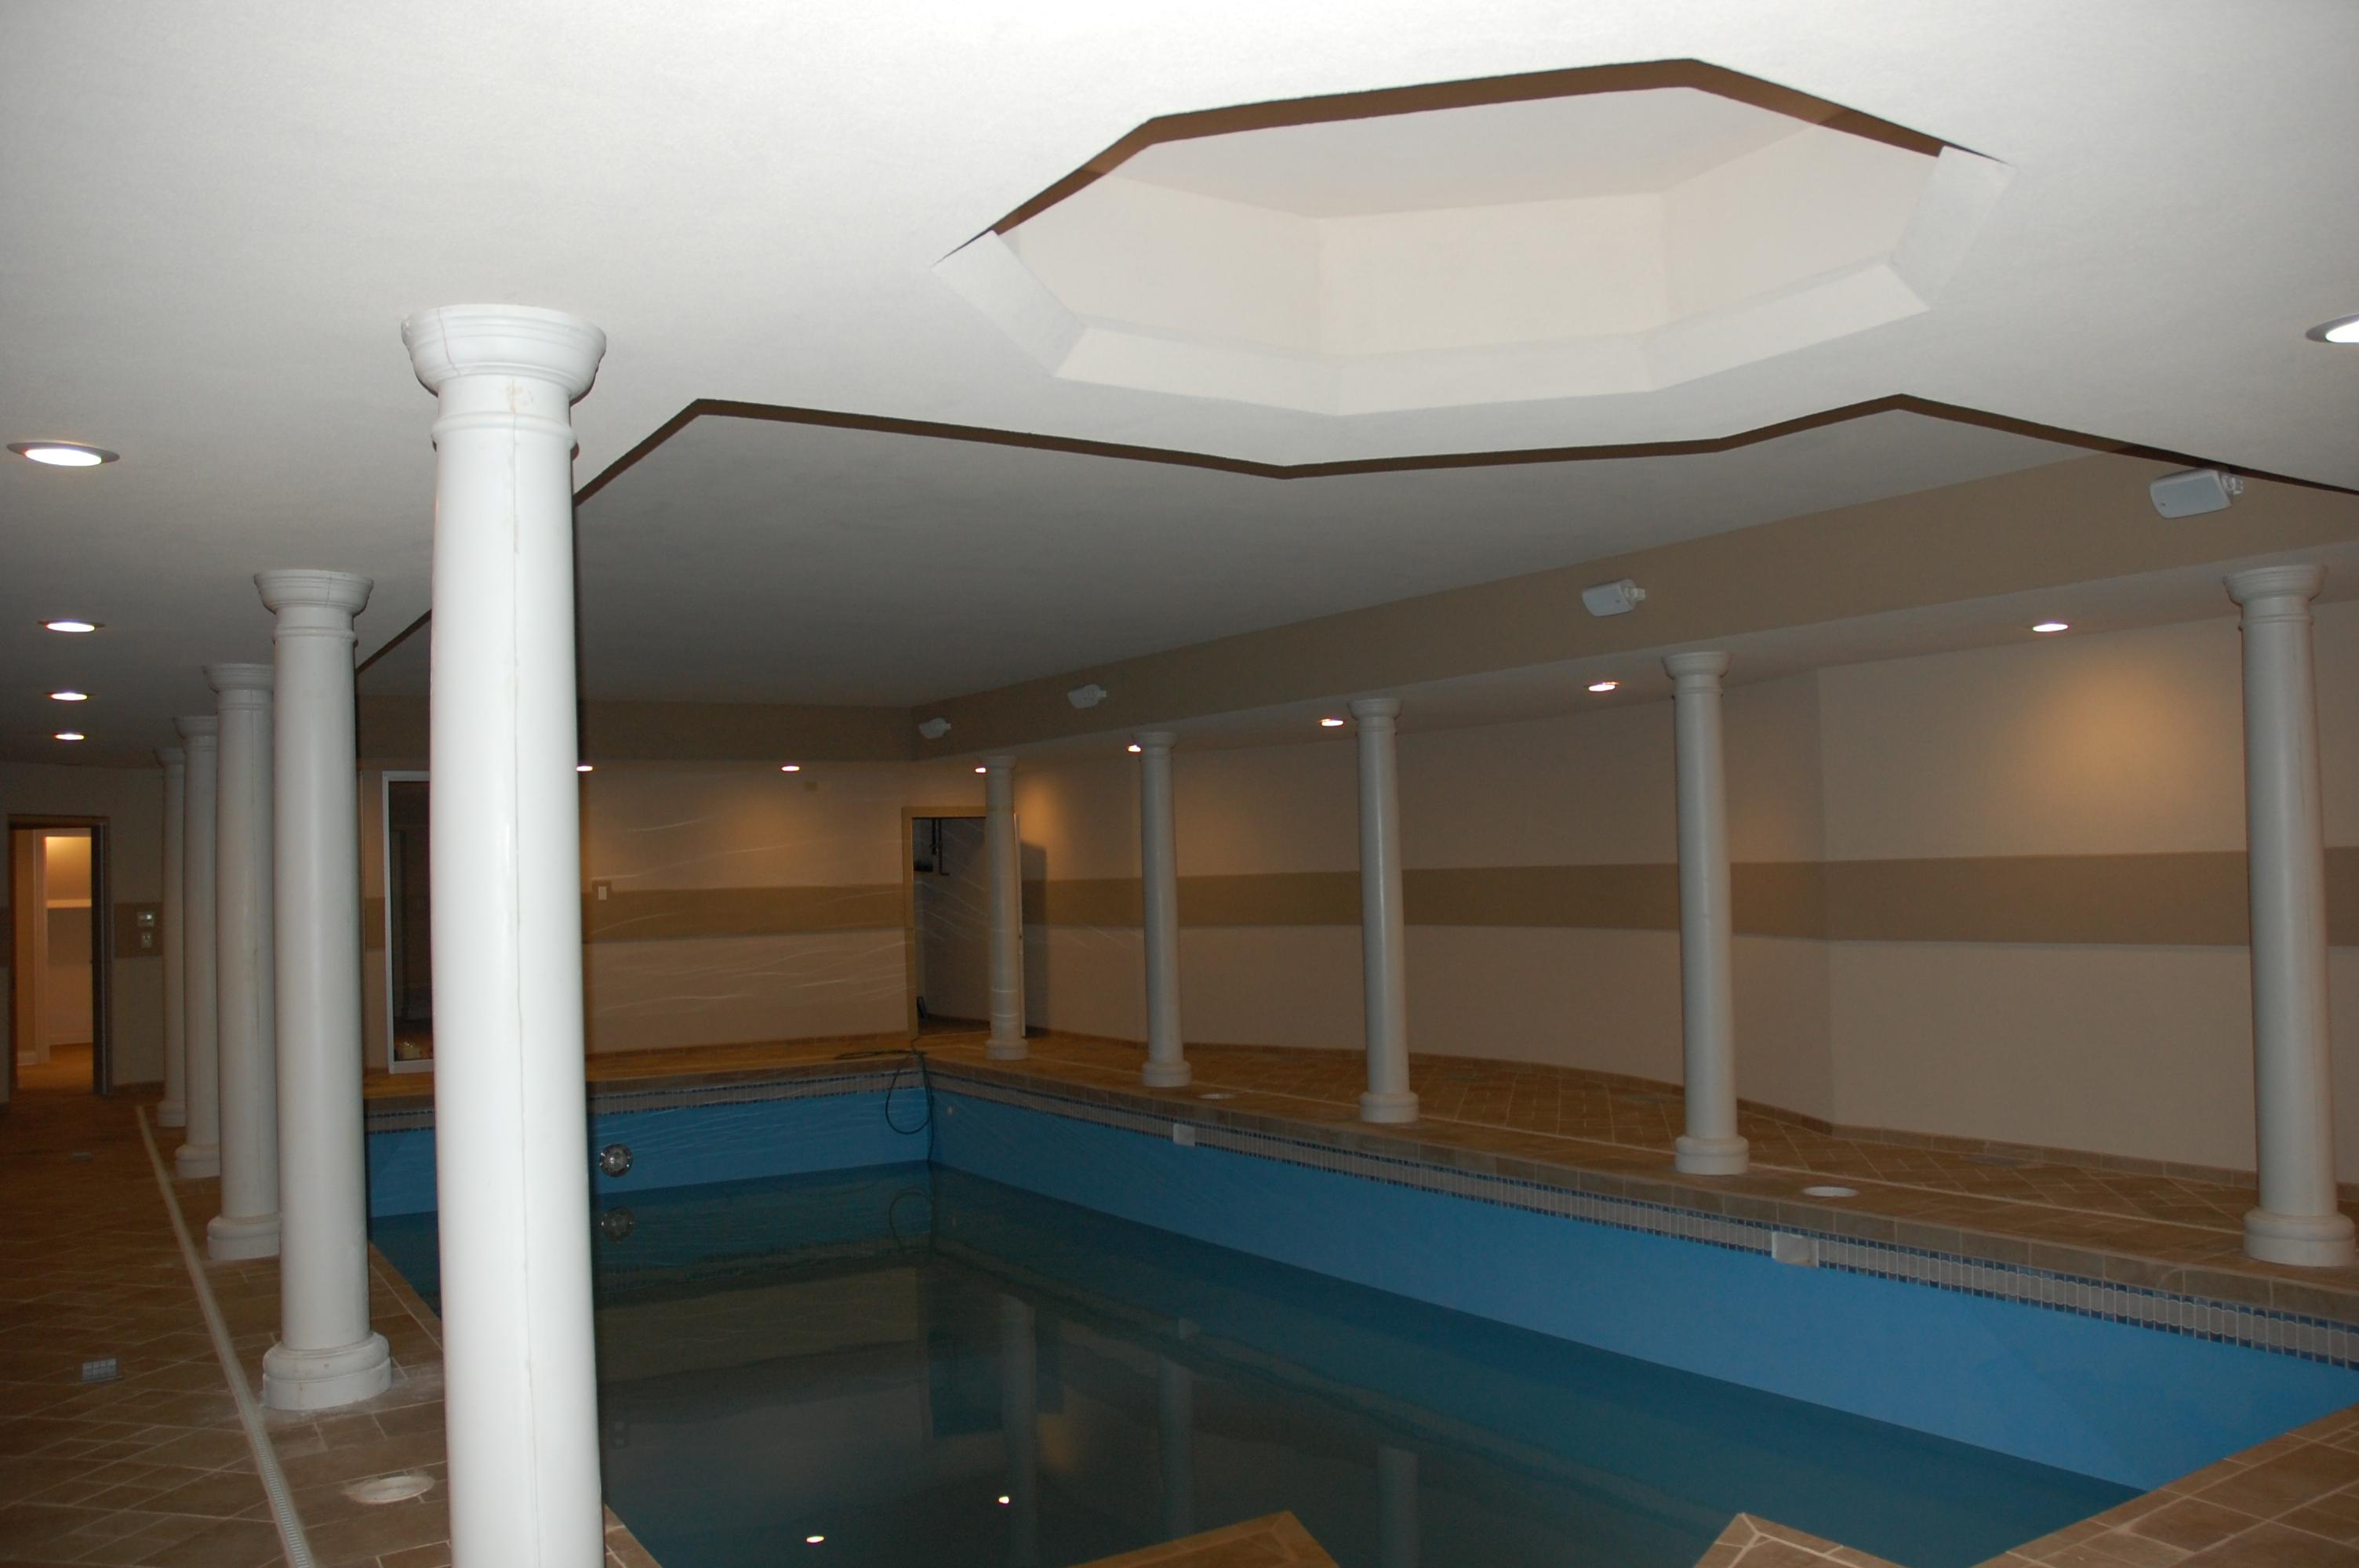 Custom Built Pool in the Basement